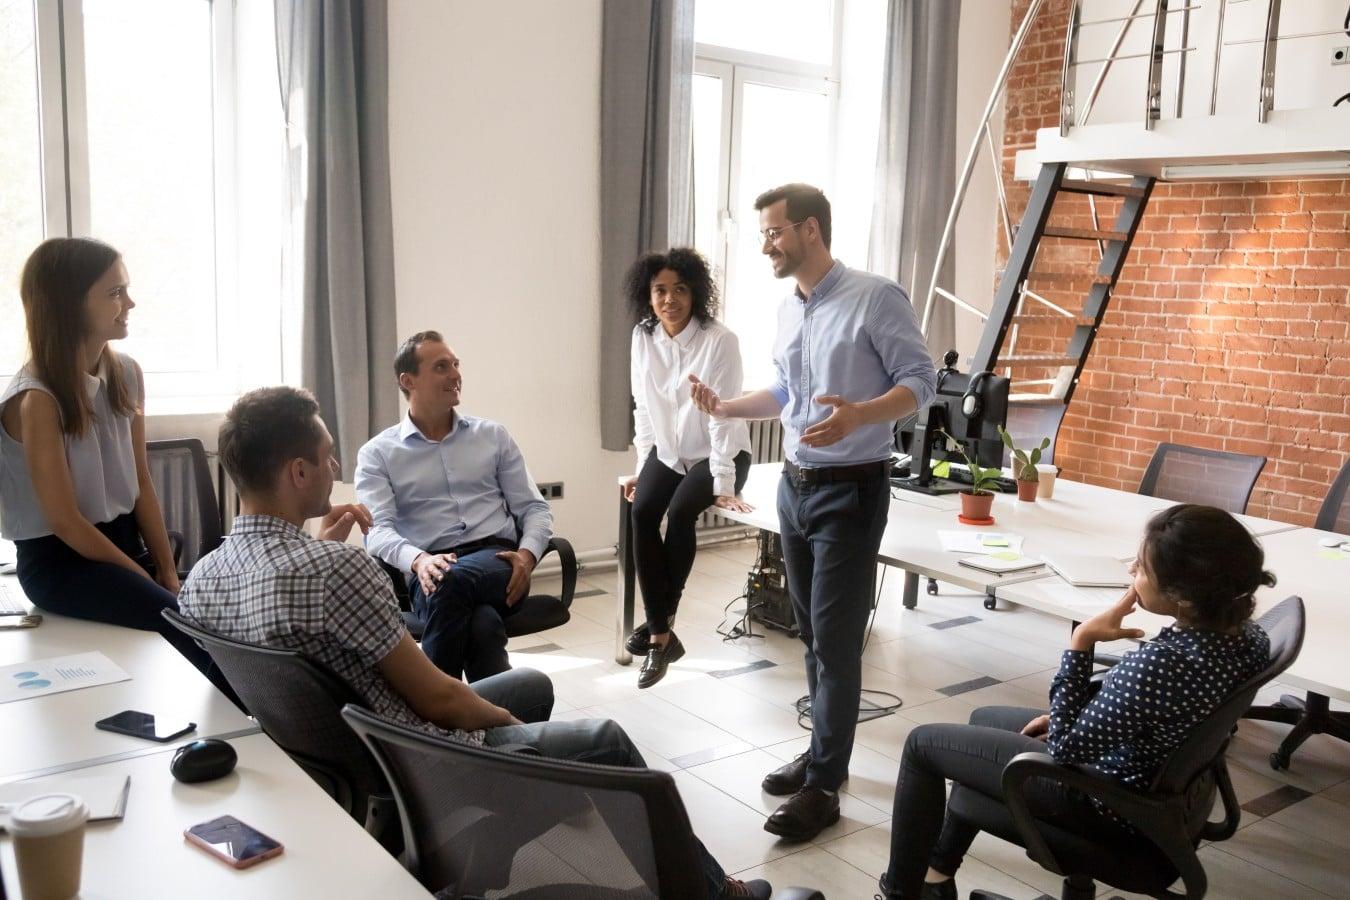 теория ситуационного лидерства